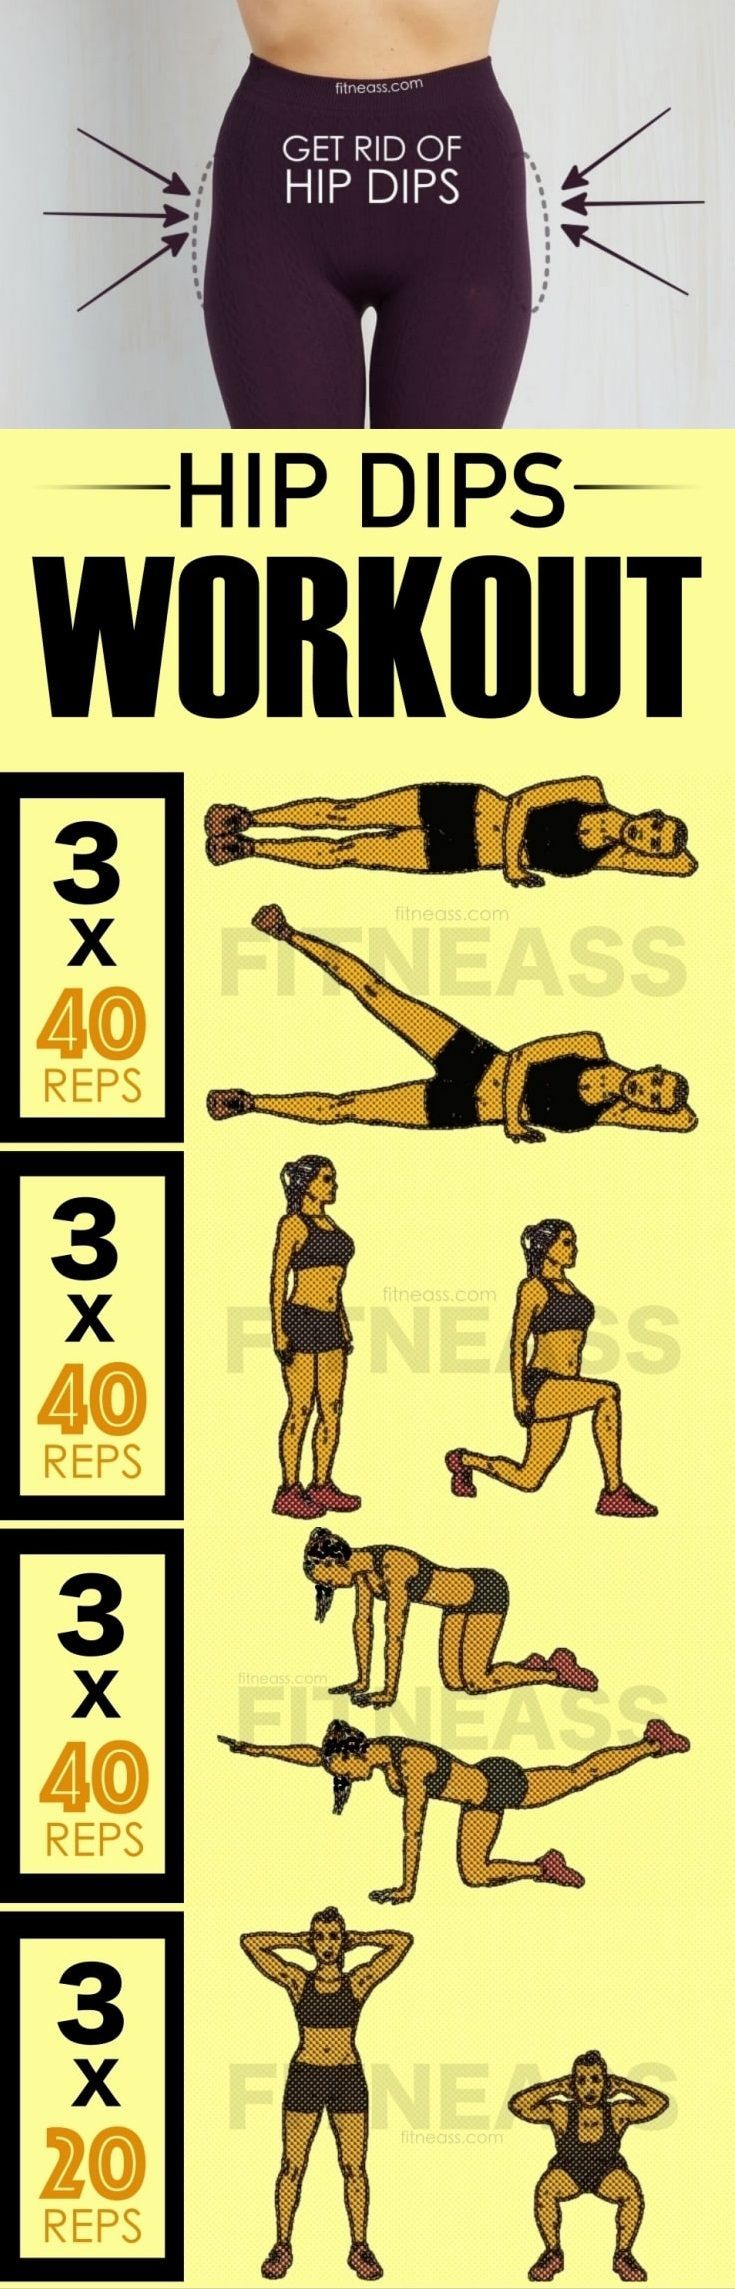 Pin on fitnesshealth